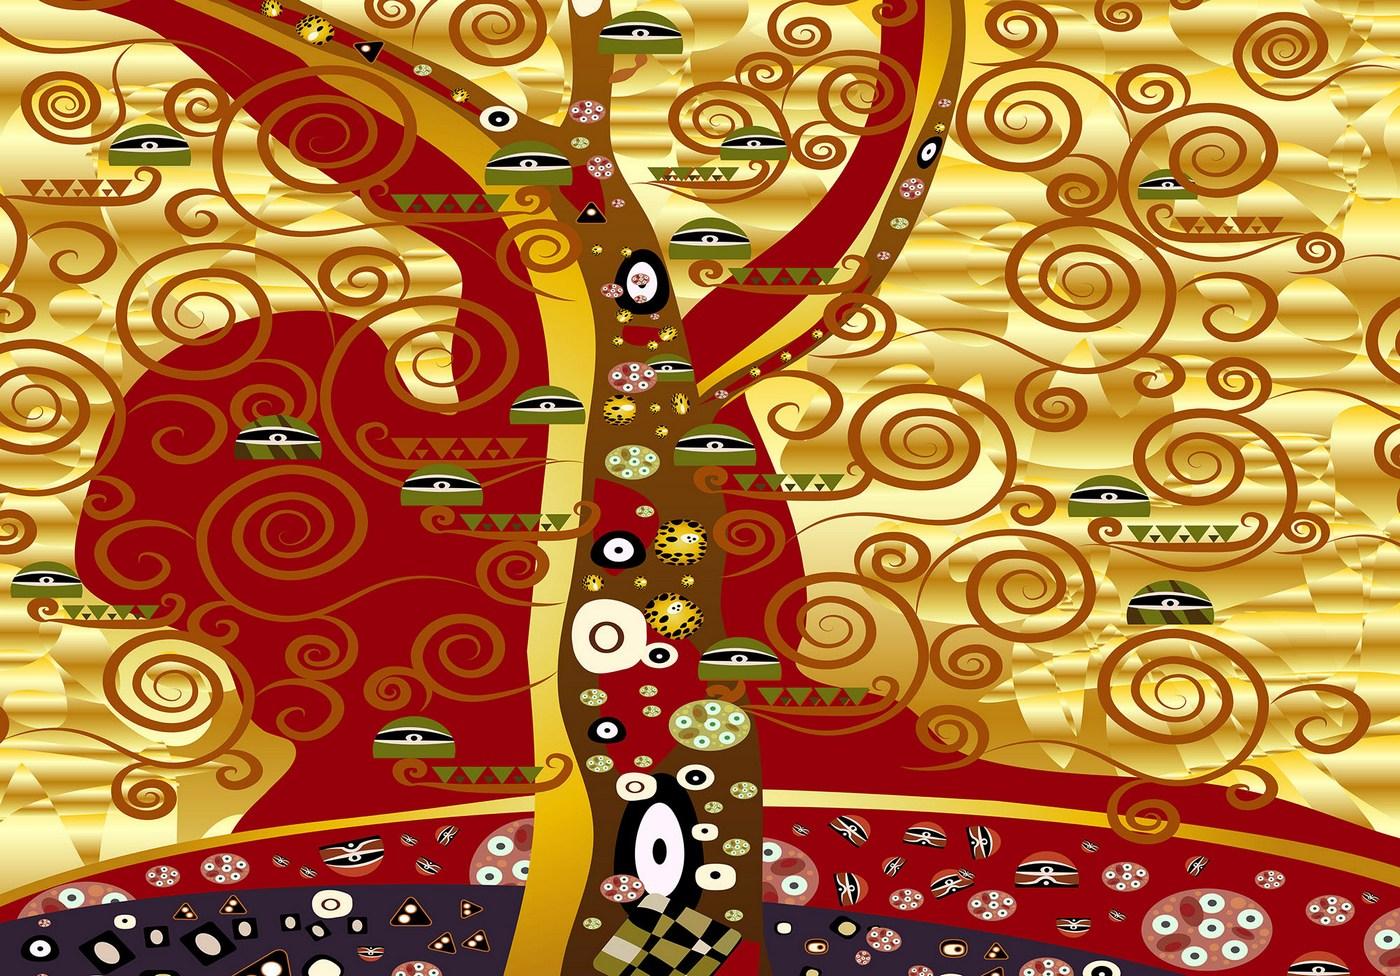 vlies fototapete 4491 gemlde kunstwerke tapete abstraktion modern muster augen rot - Tapete Rot Muster